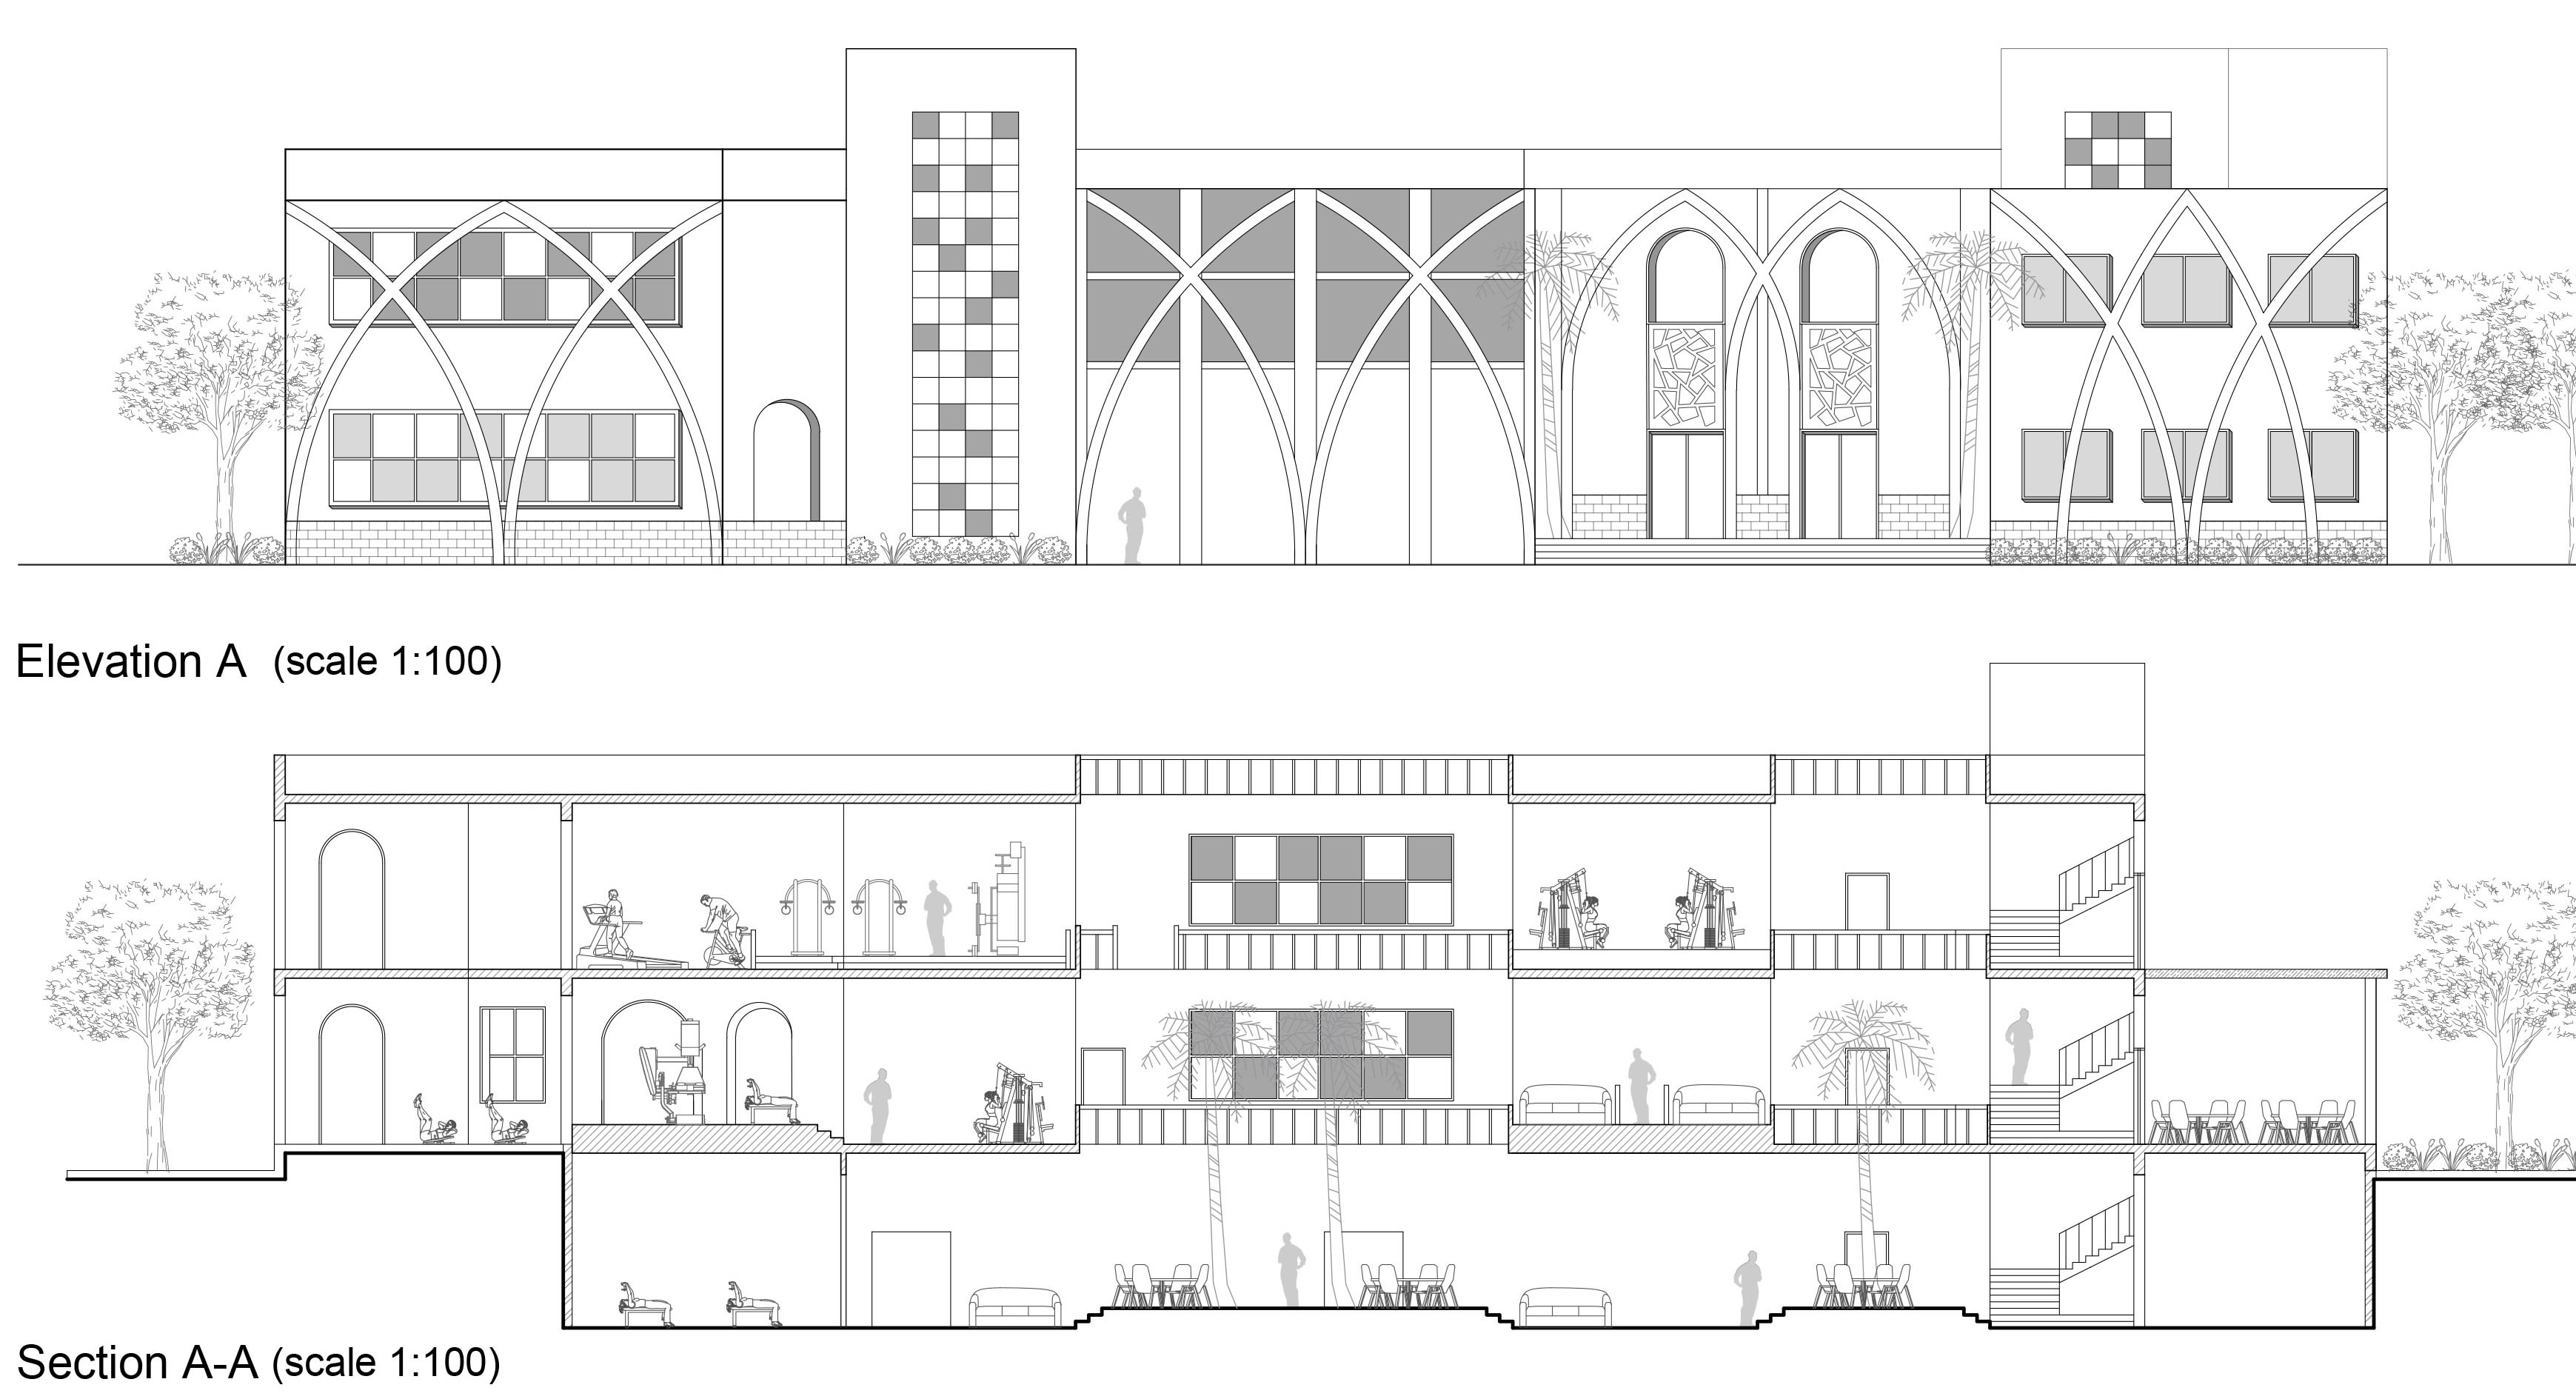 Architecture autocad floor plans,  sections elevations 3dmax